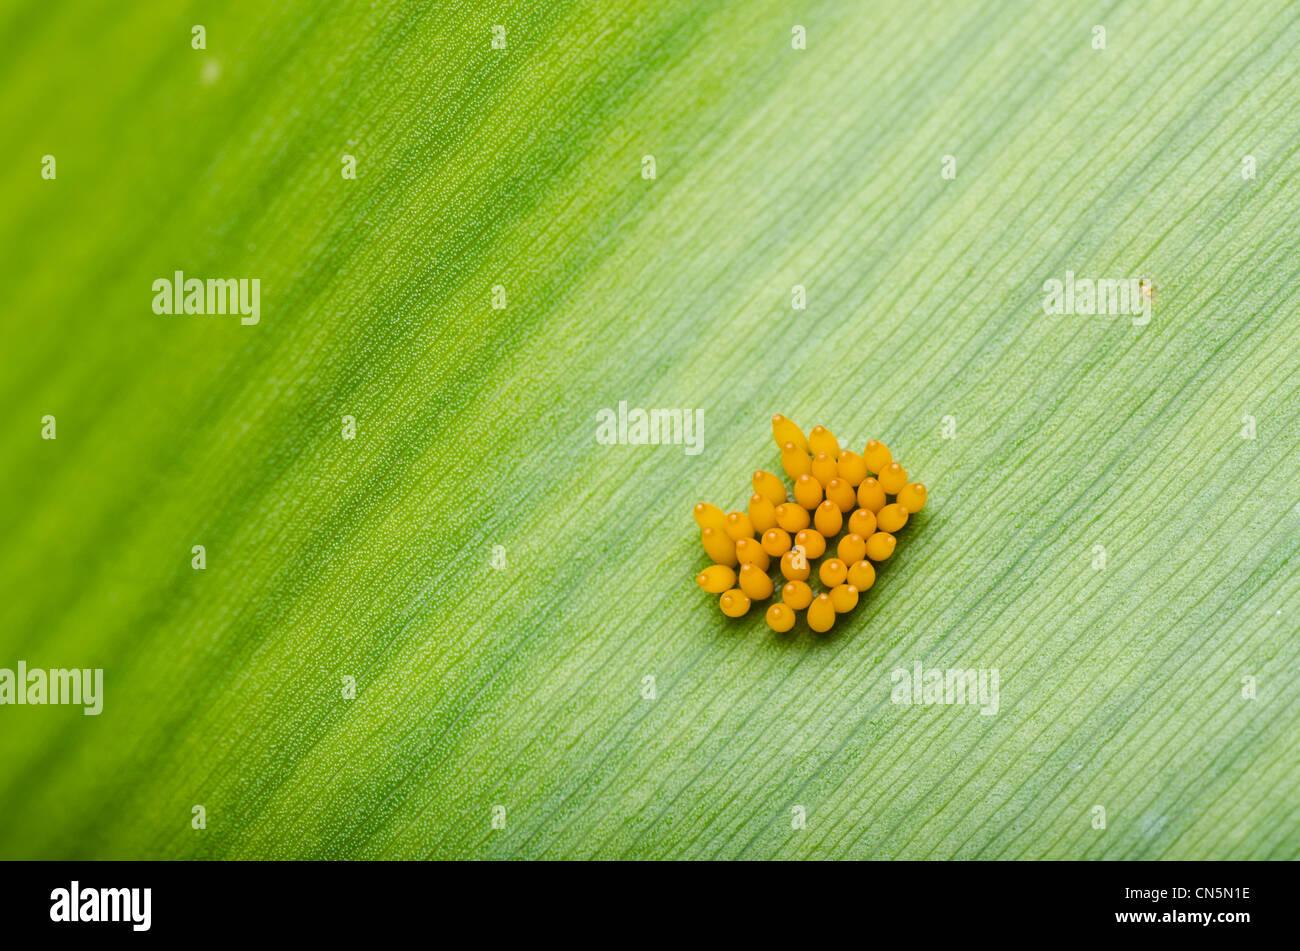 Ladybug egg on leaf in green nature Stock Photo